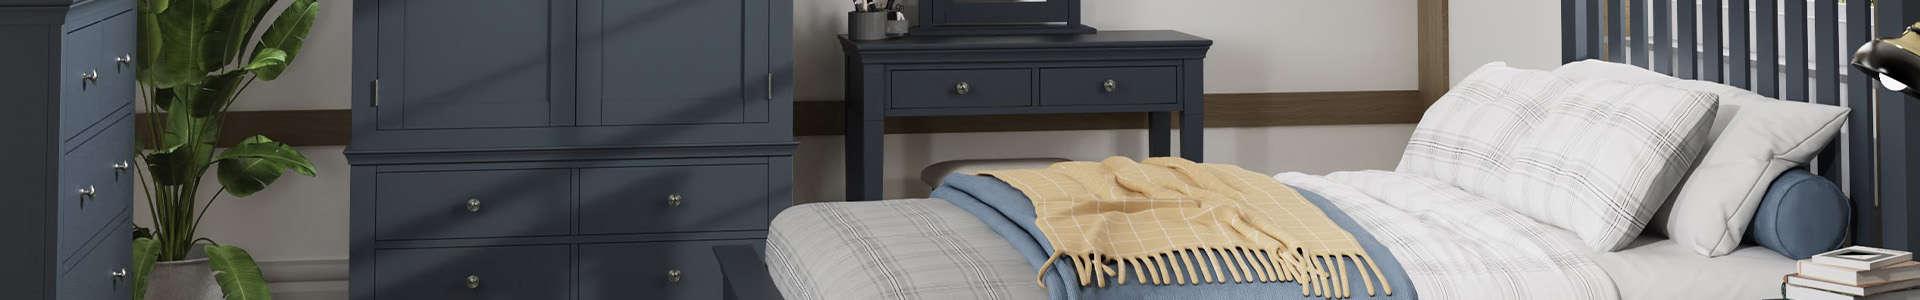 sw bedroom mg thin